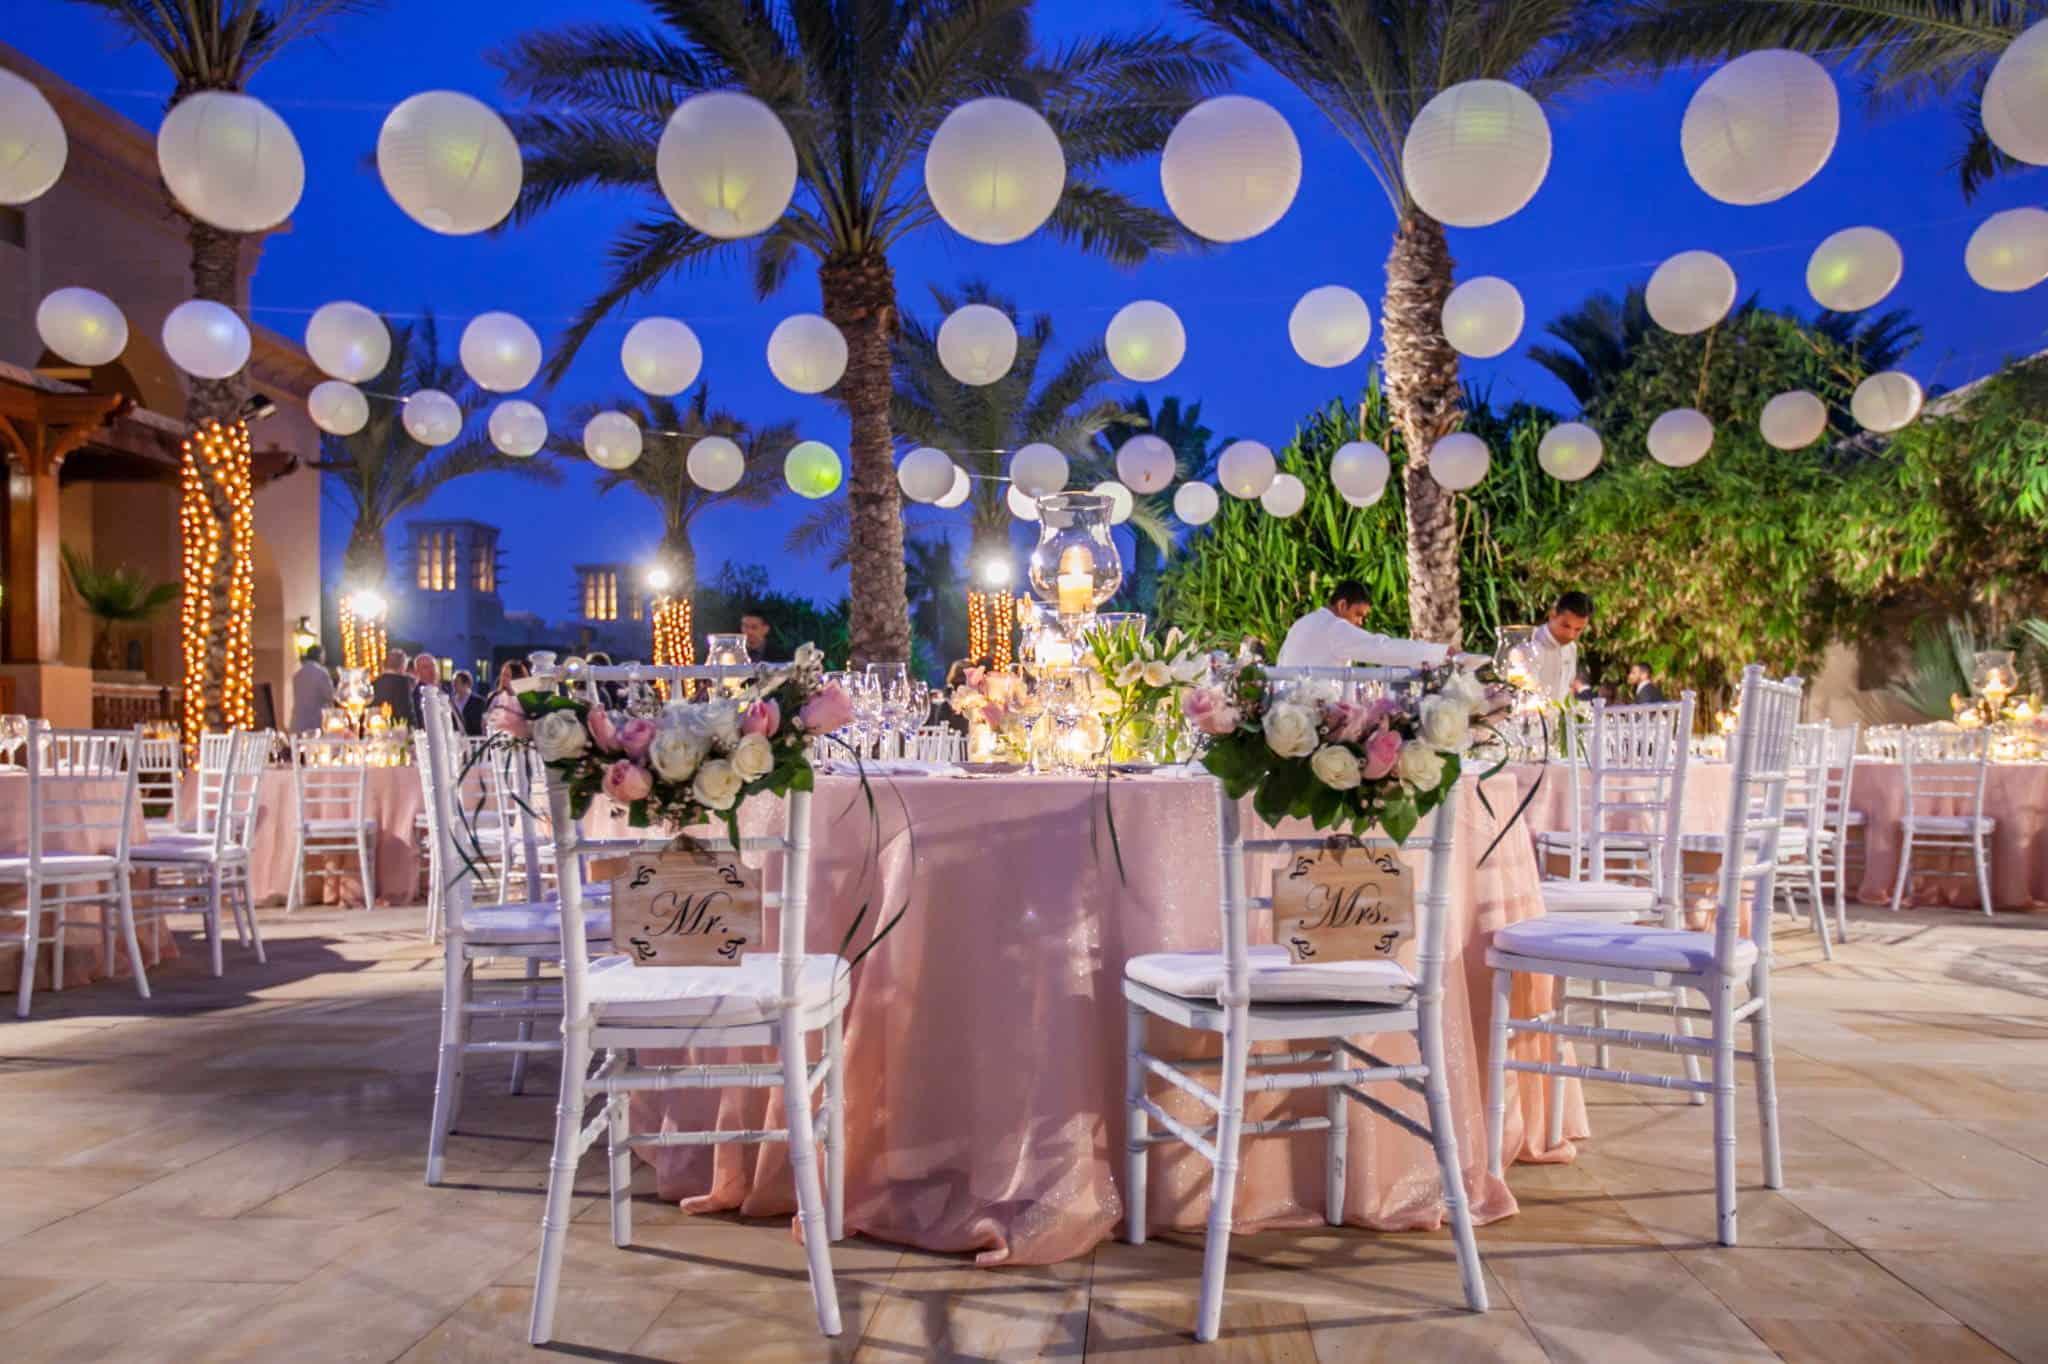 marrakech wedding planner Marrakech Wedding Planner GT06